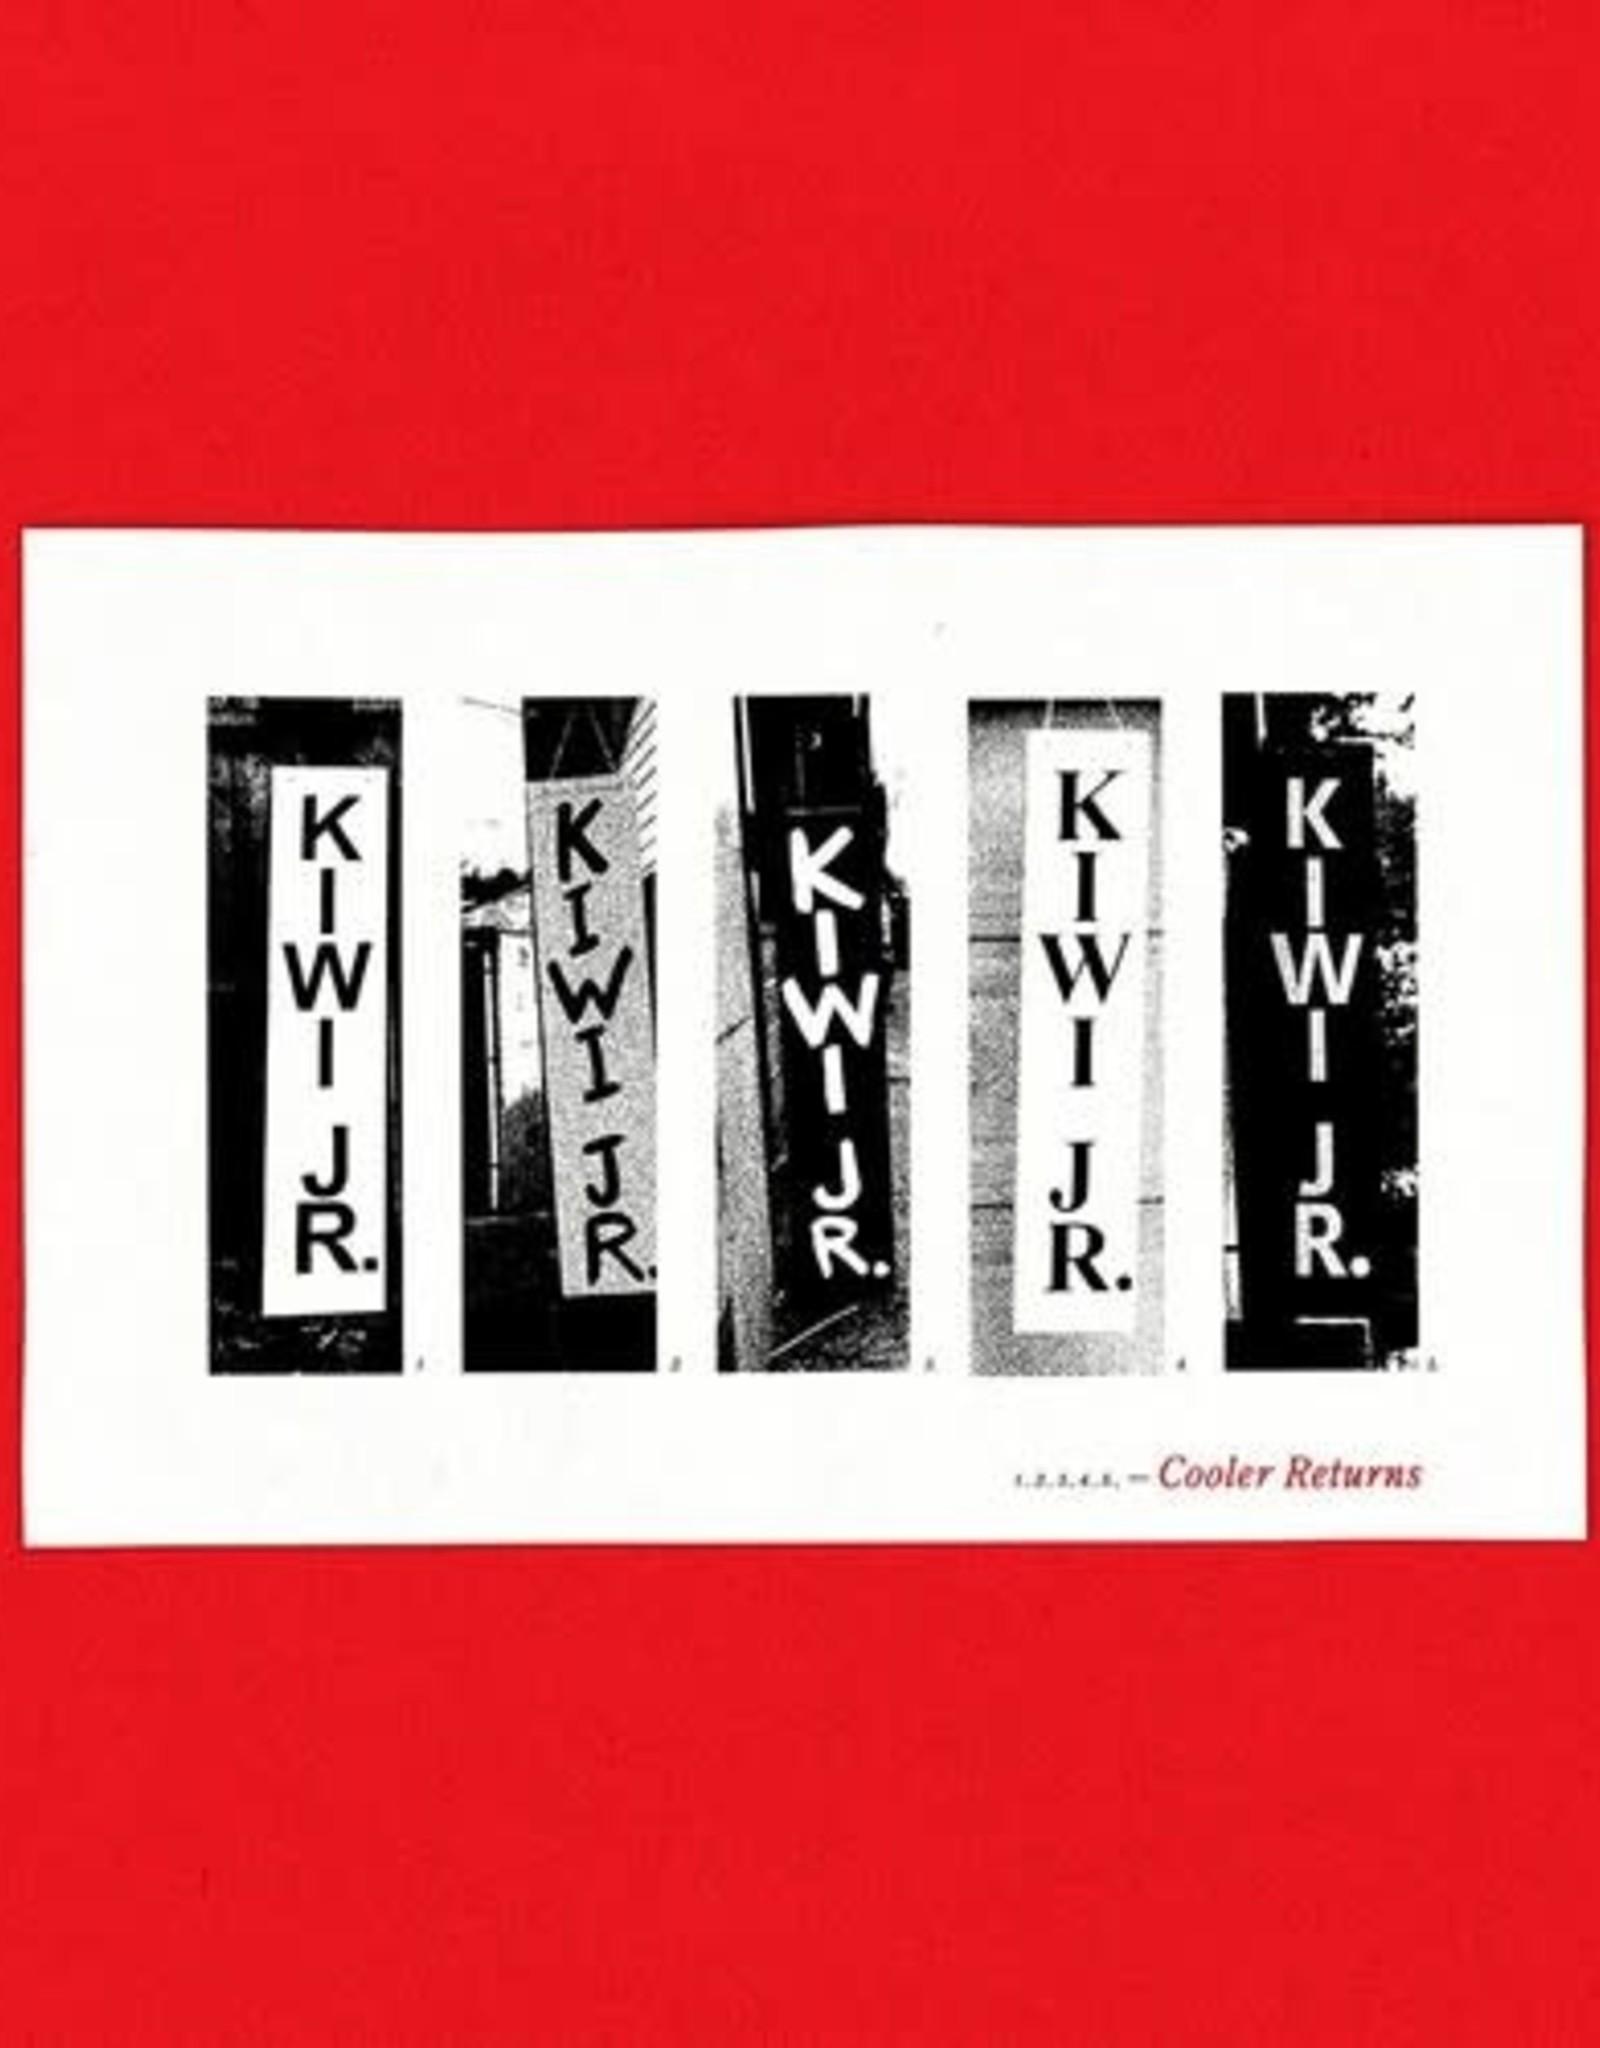 Kiwi Jr. - Cooler Returns